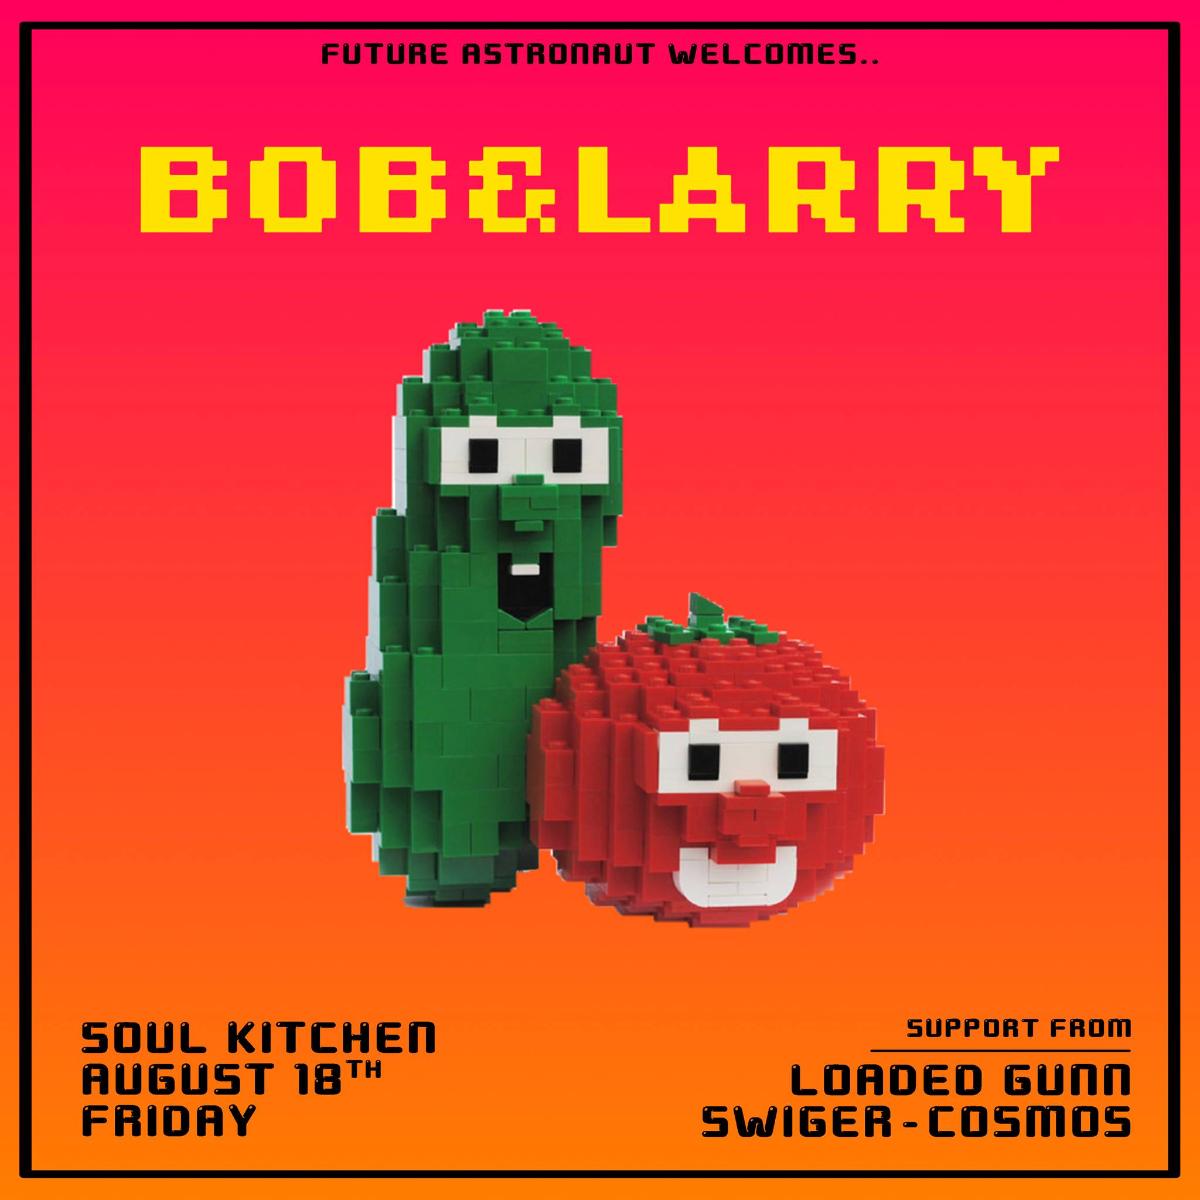 Bob & Larry, Swiger/ Whatever/ Logan Gunn/ Cosmos